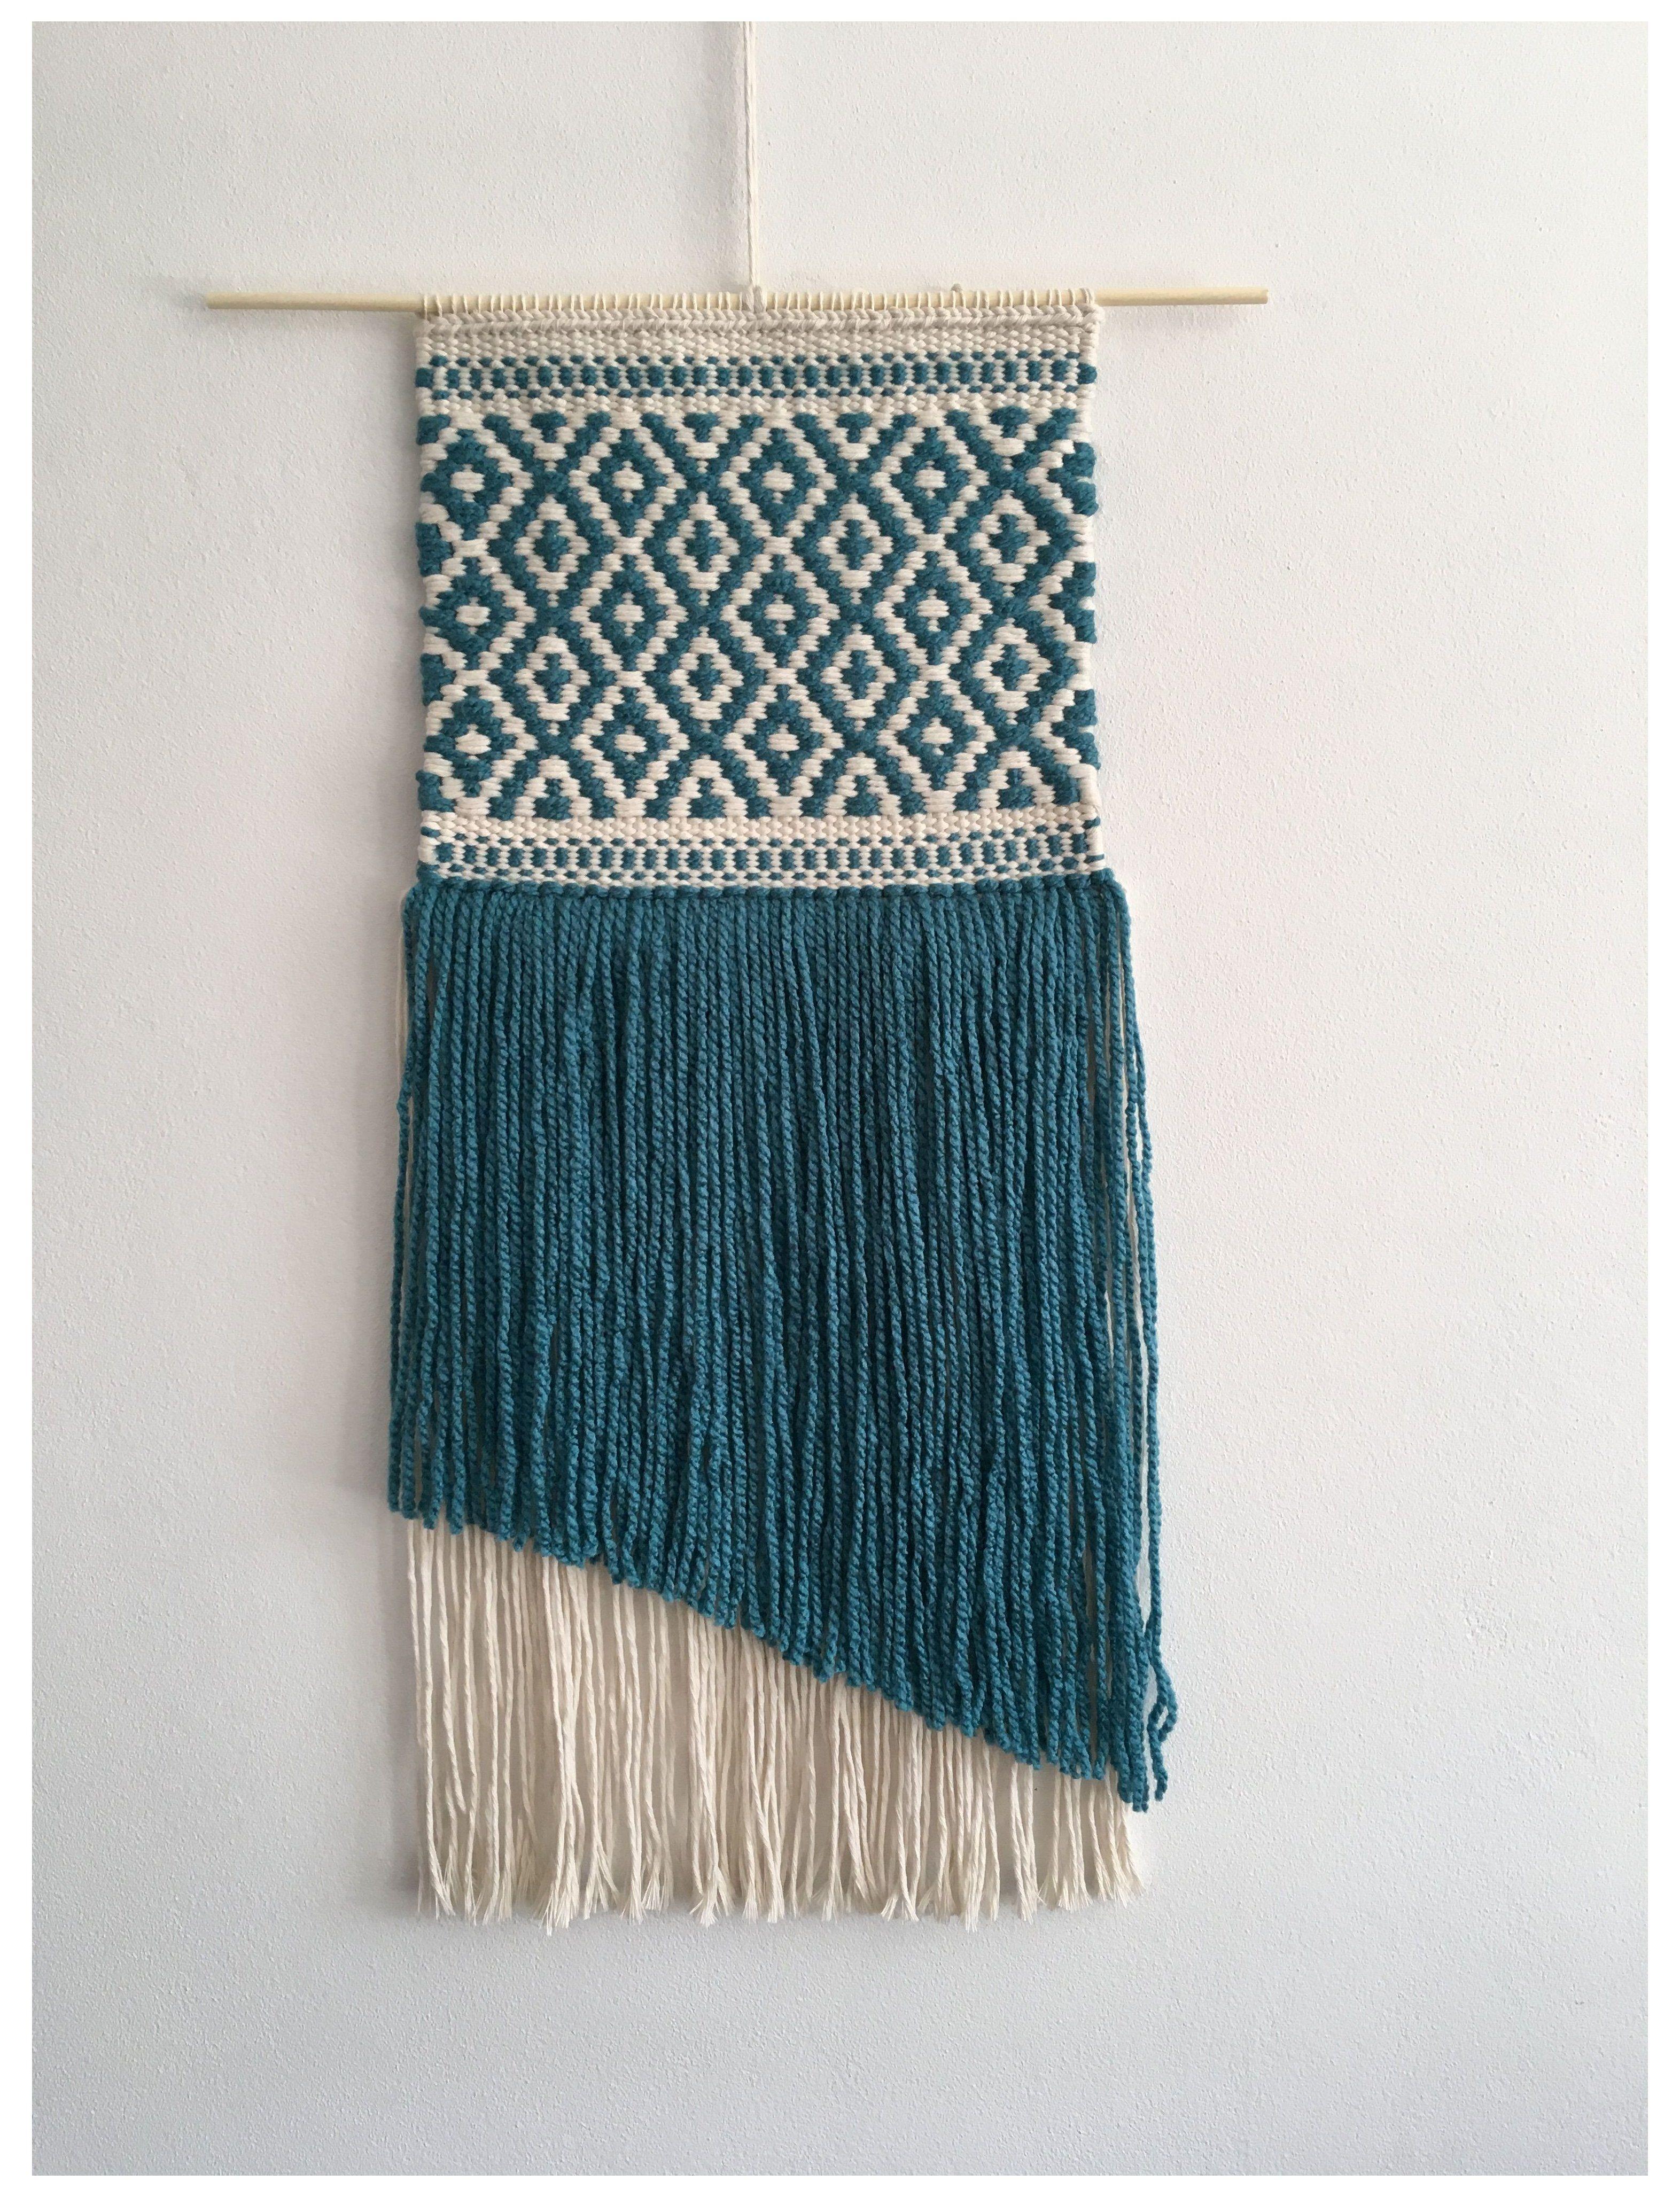 tapestry weaving patterns ideas